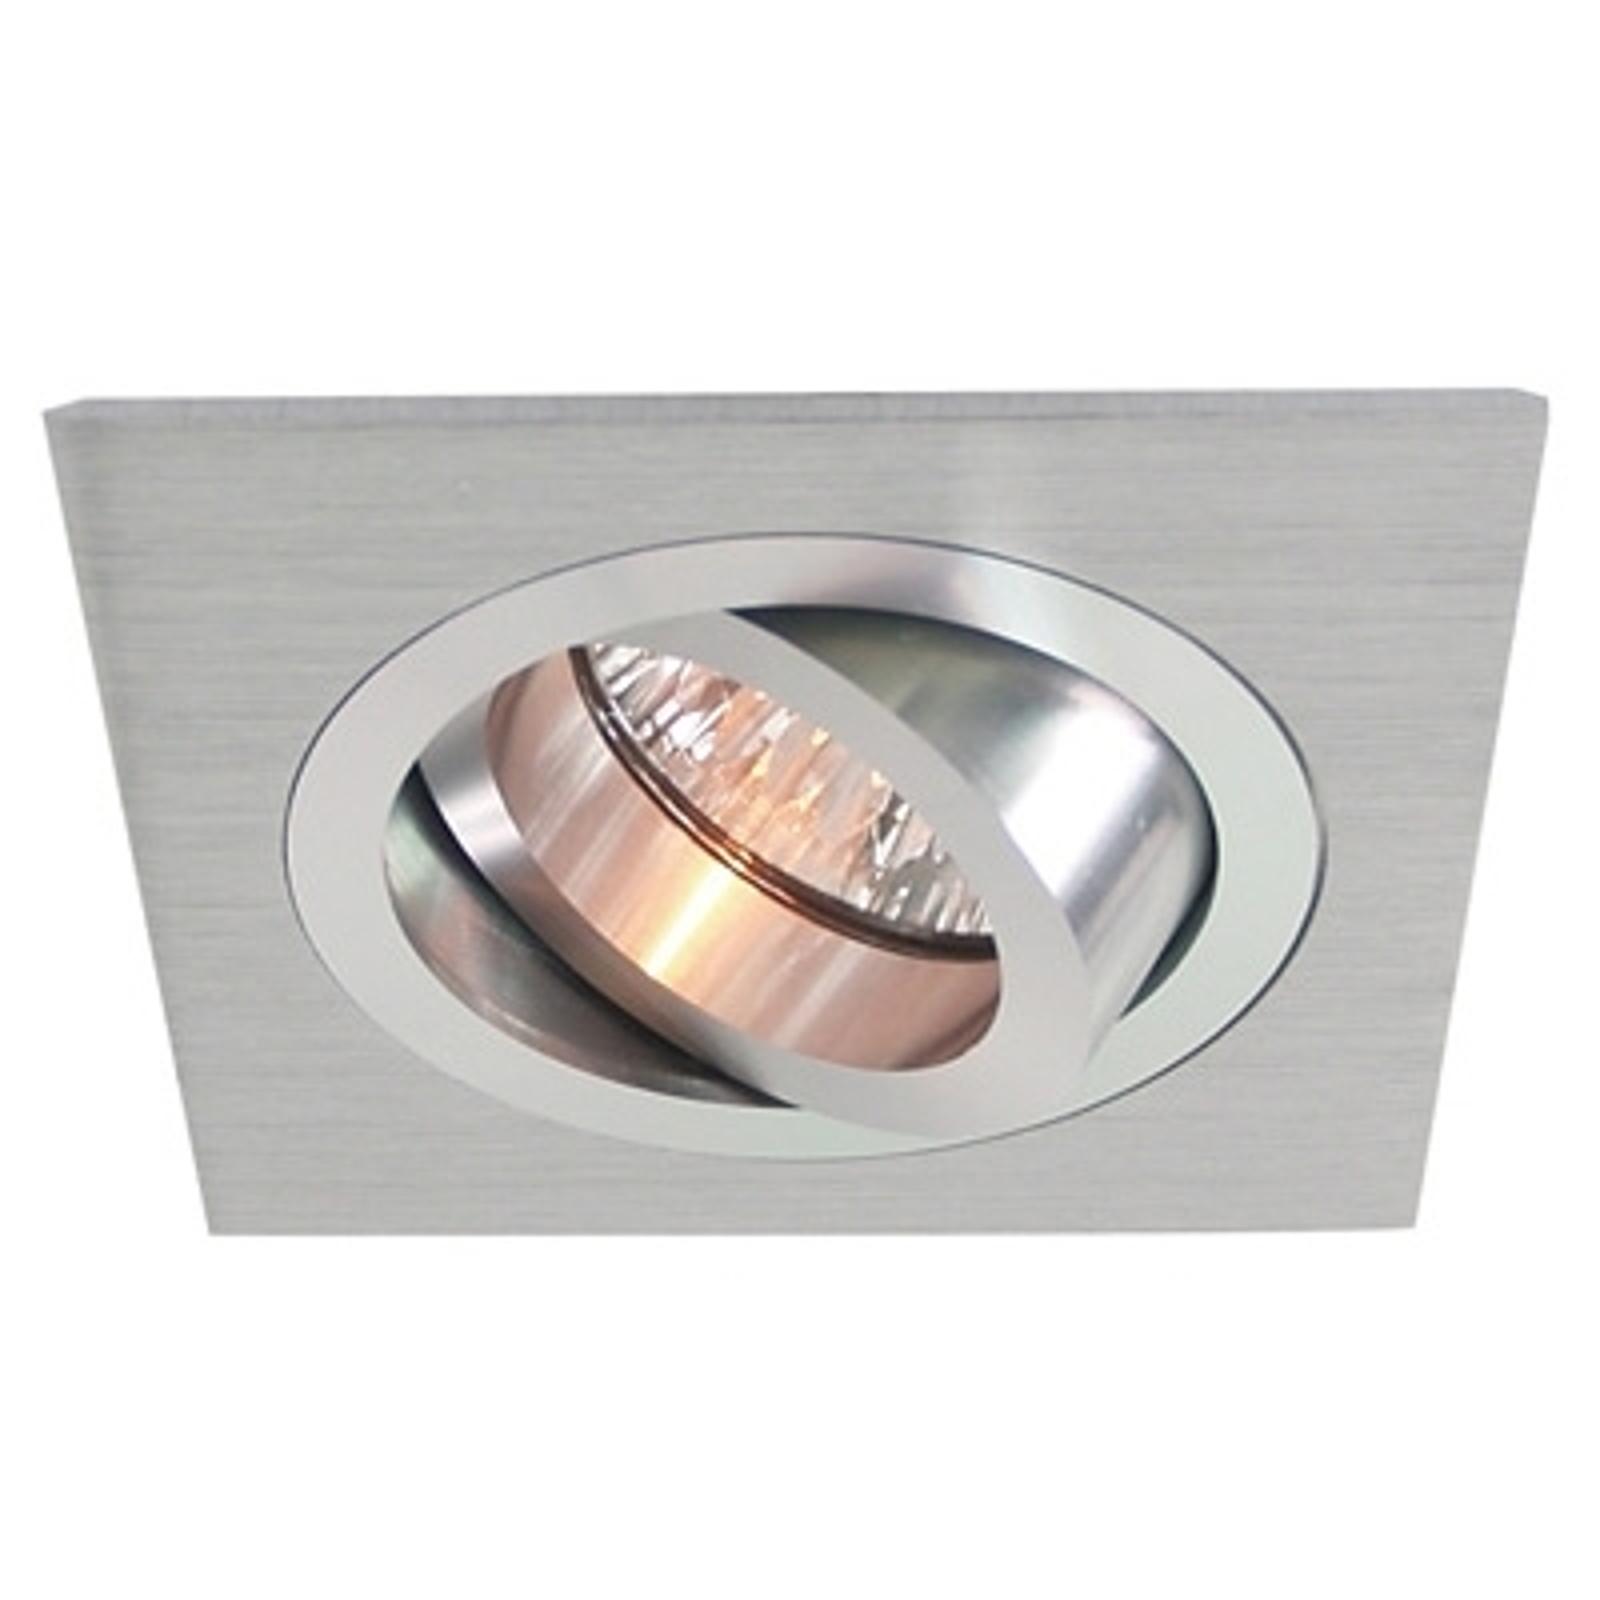 Vridbar monteringsring, aluminium, 9,2x9,2 cm